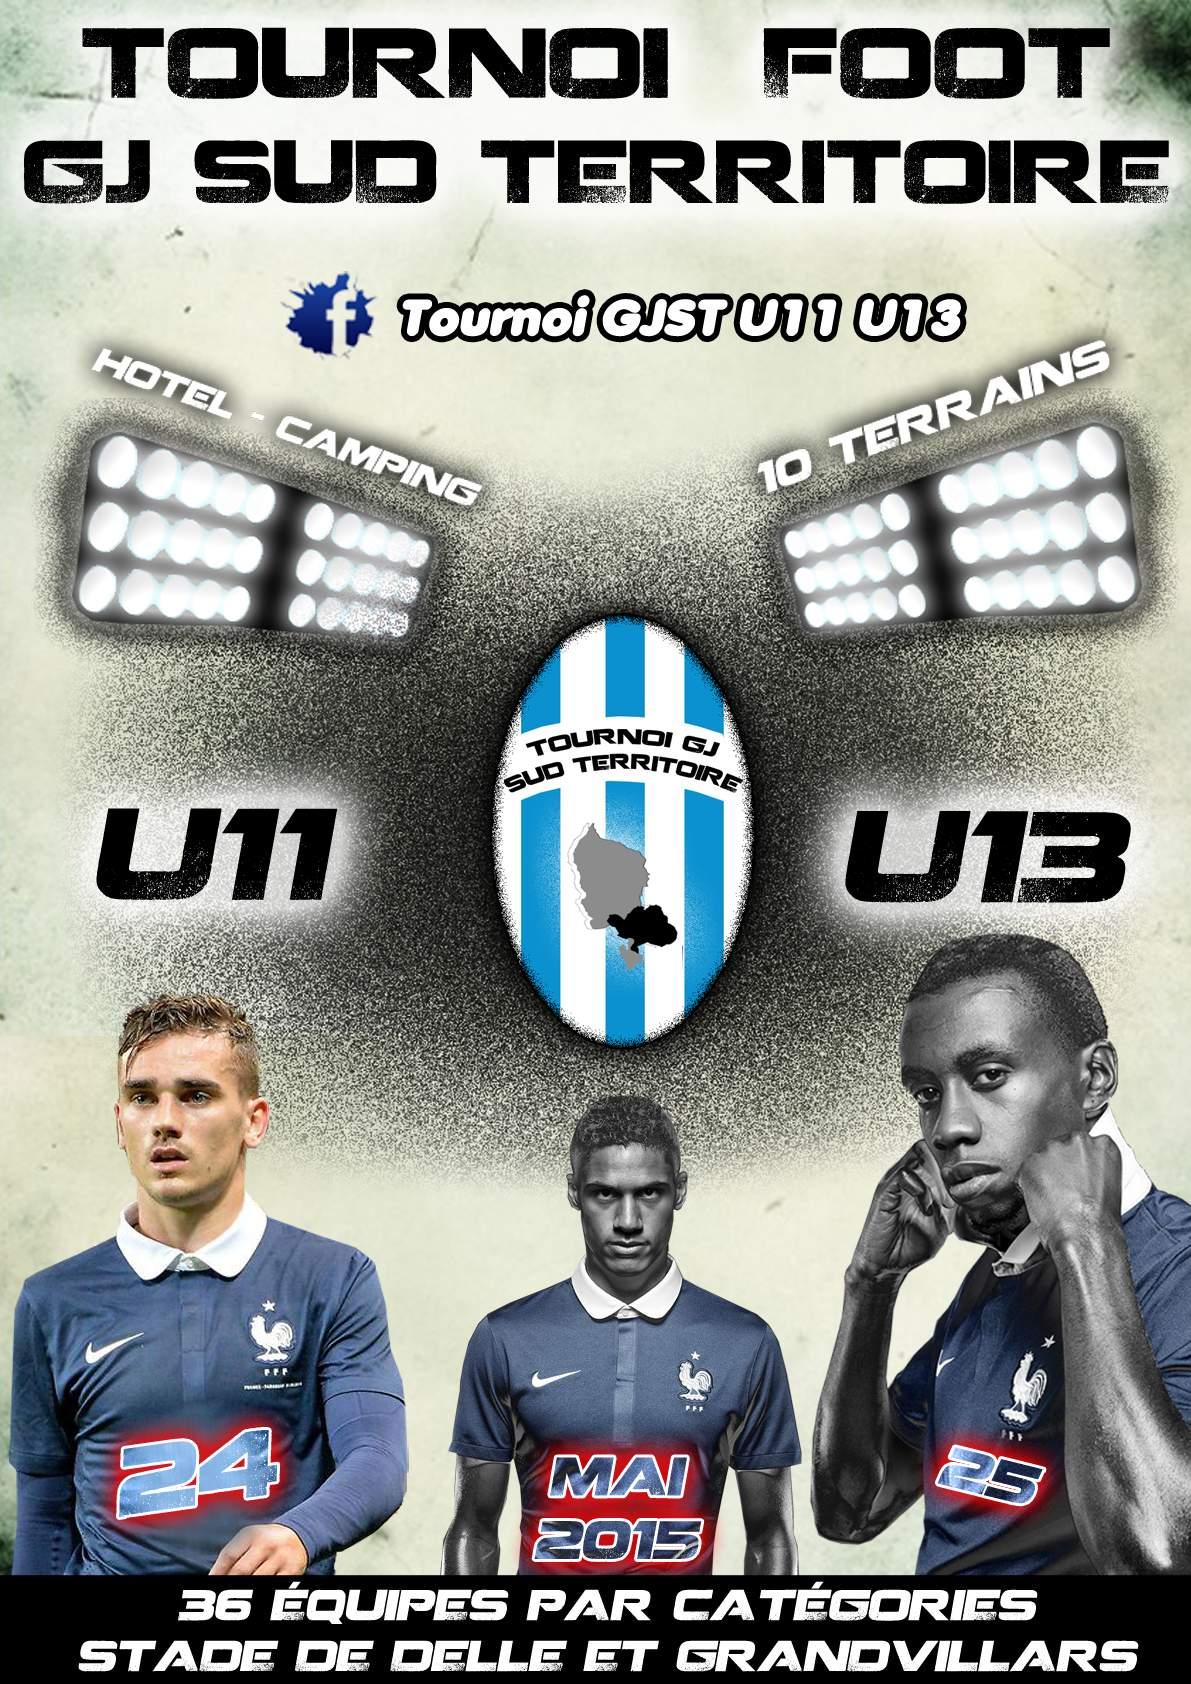 album plaquette 2015 photo n 176 1 tournoi football tournoi foot gj sud territoire footeo